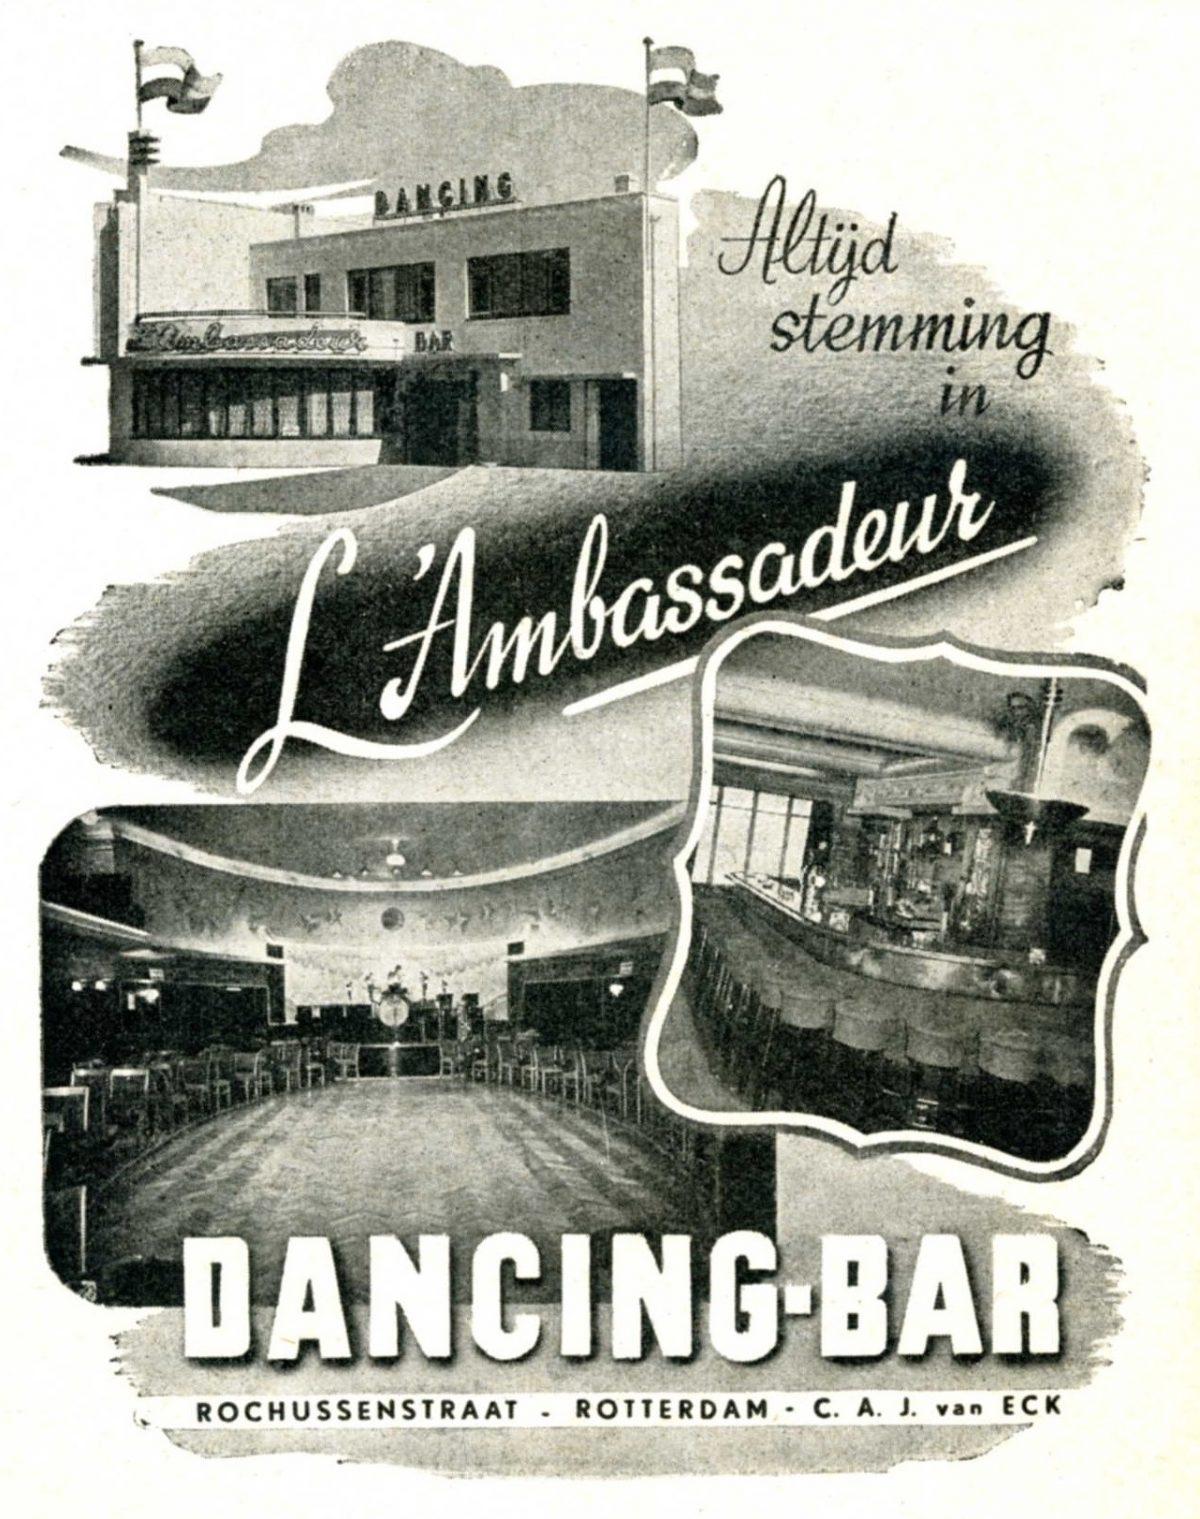 Noodw Ambassadeur Maasstad 1948 1